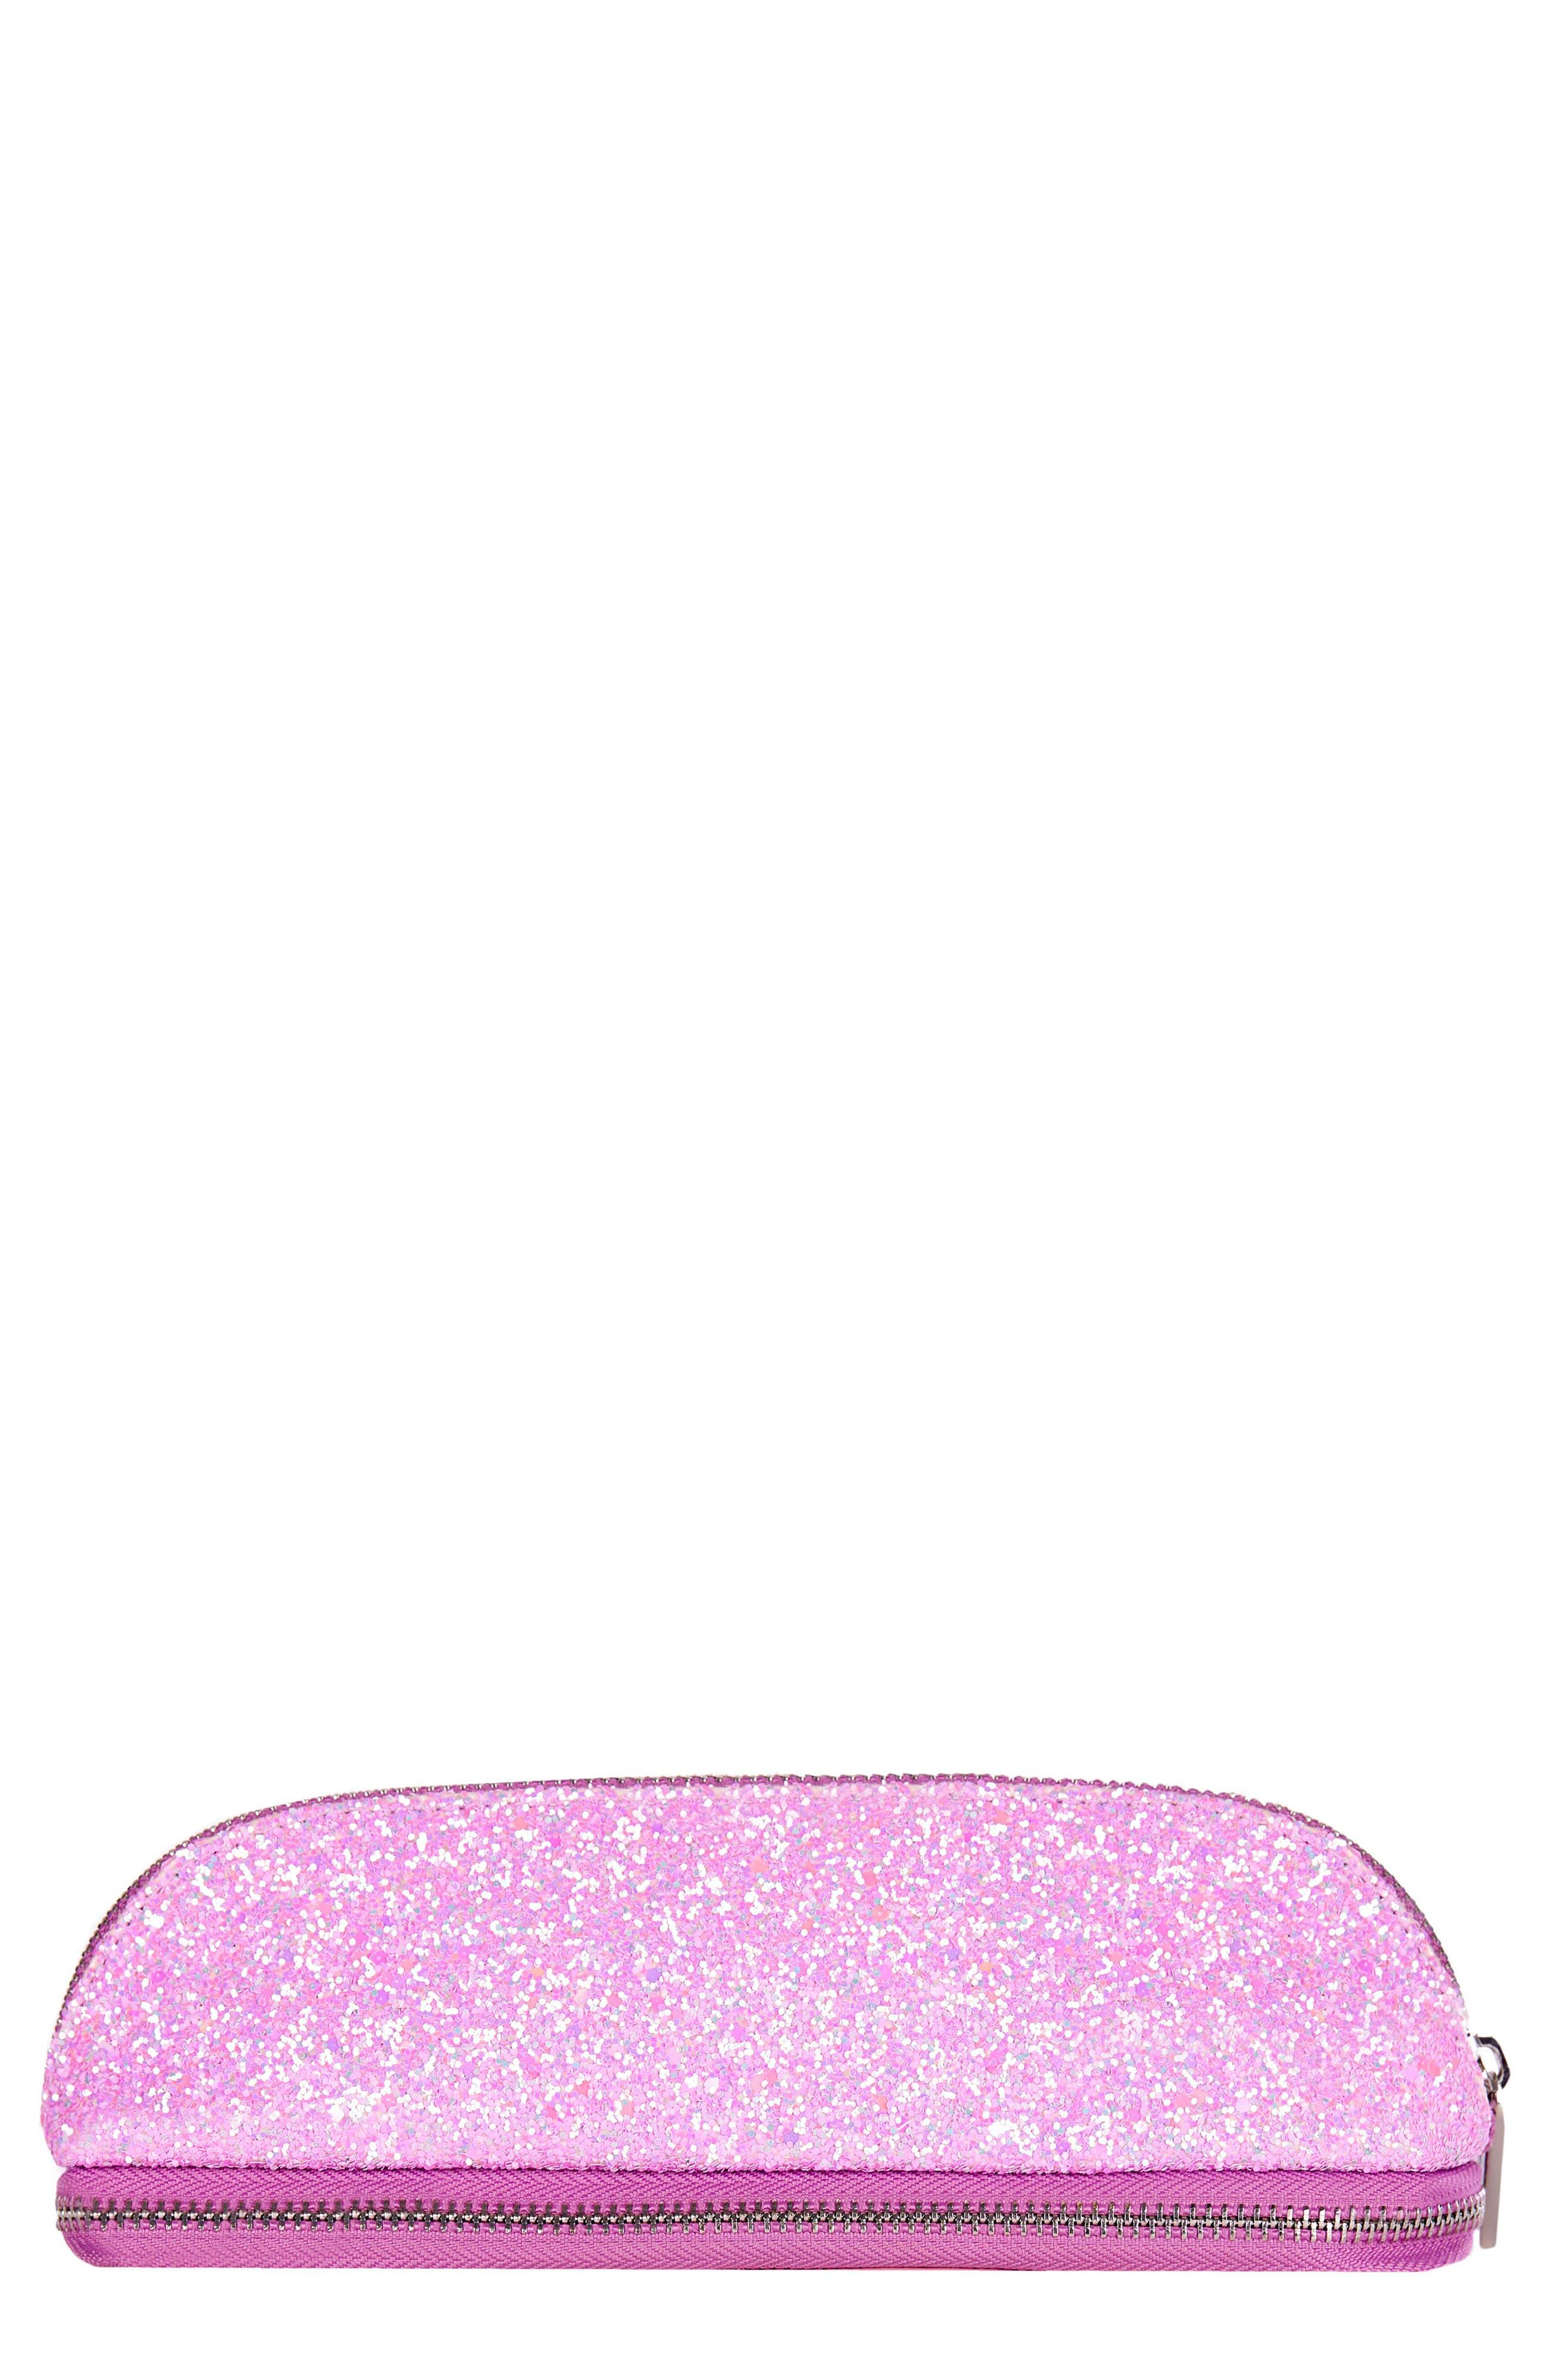 Glitsy Pink Makeup Brush Cosmetics Case,                         Main,                         color, NO COLOR